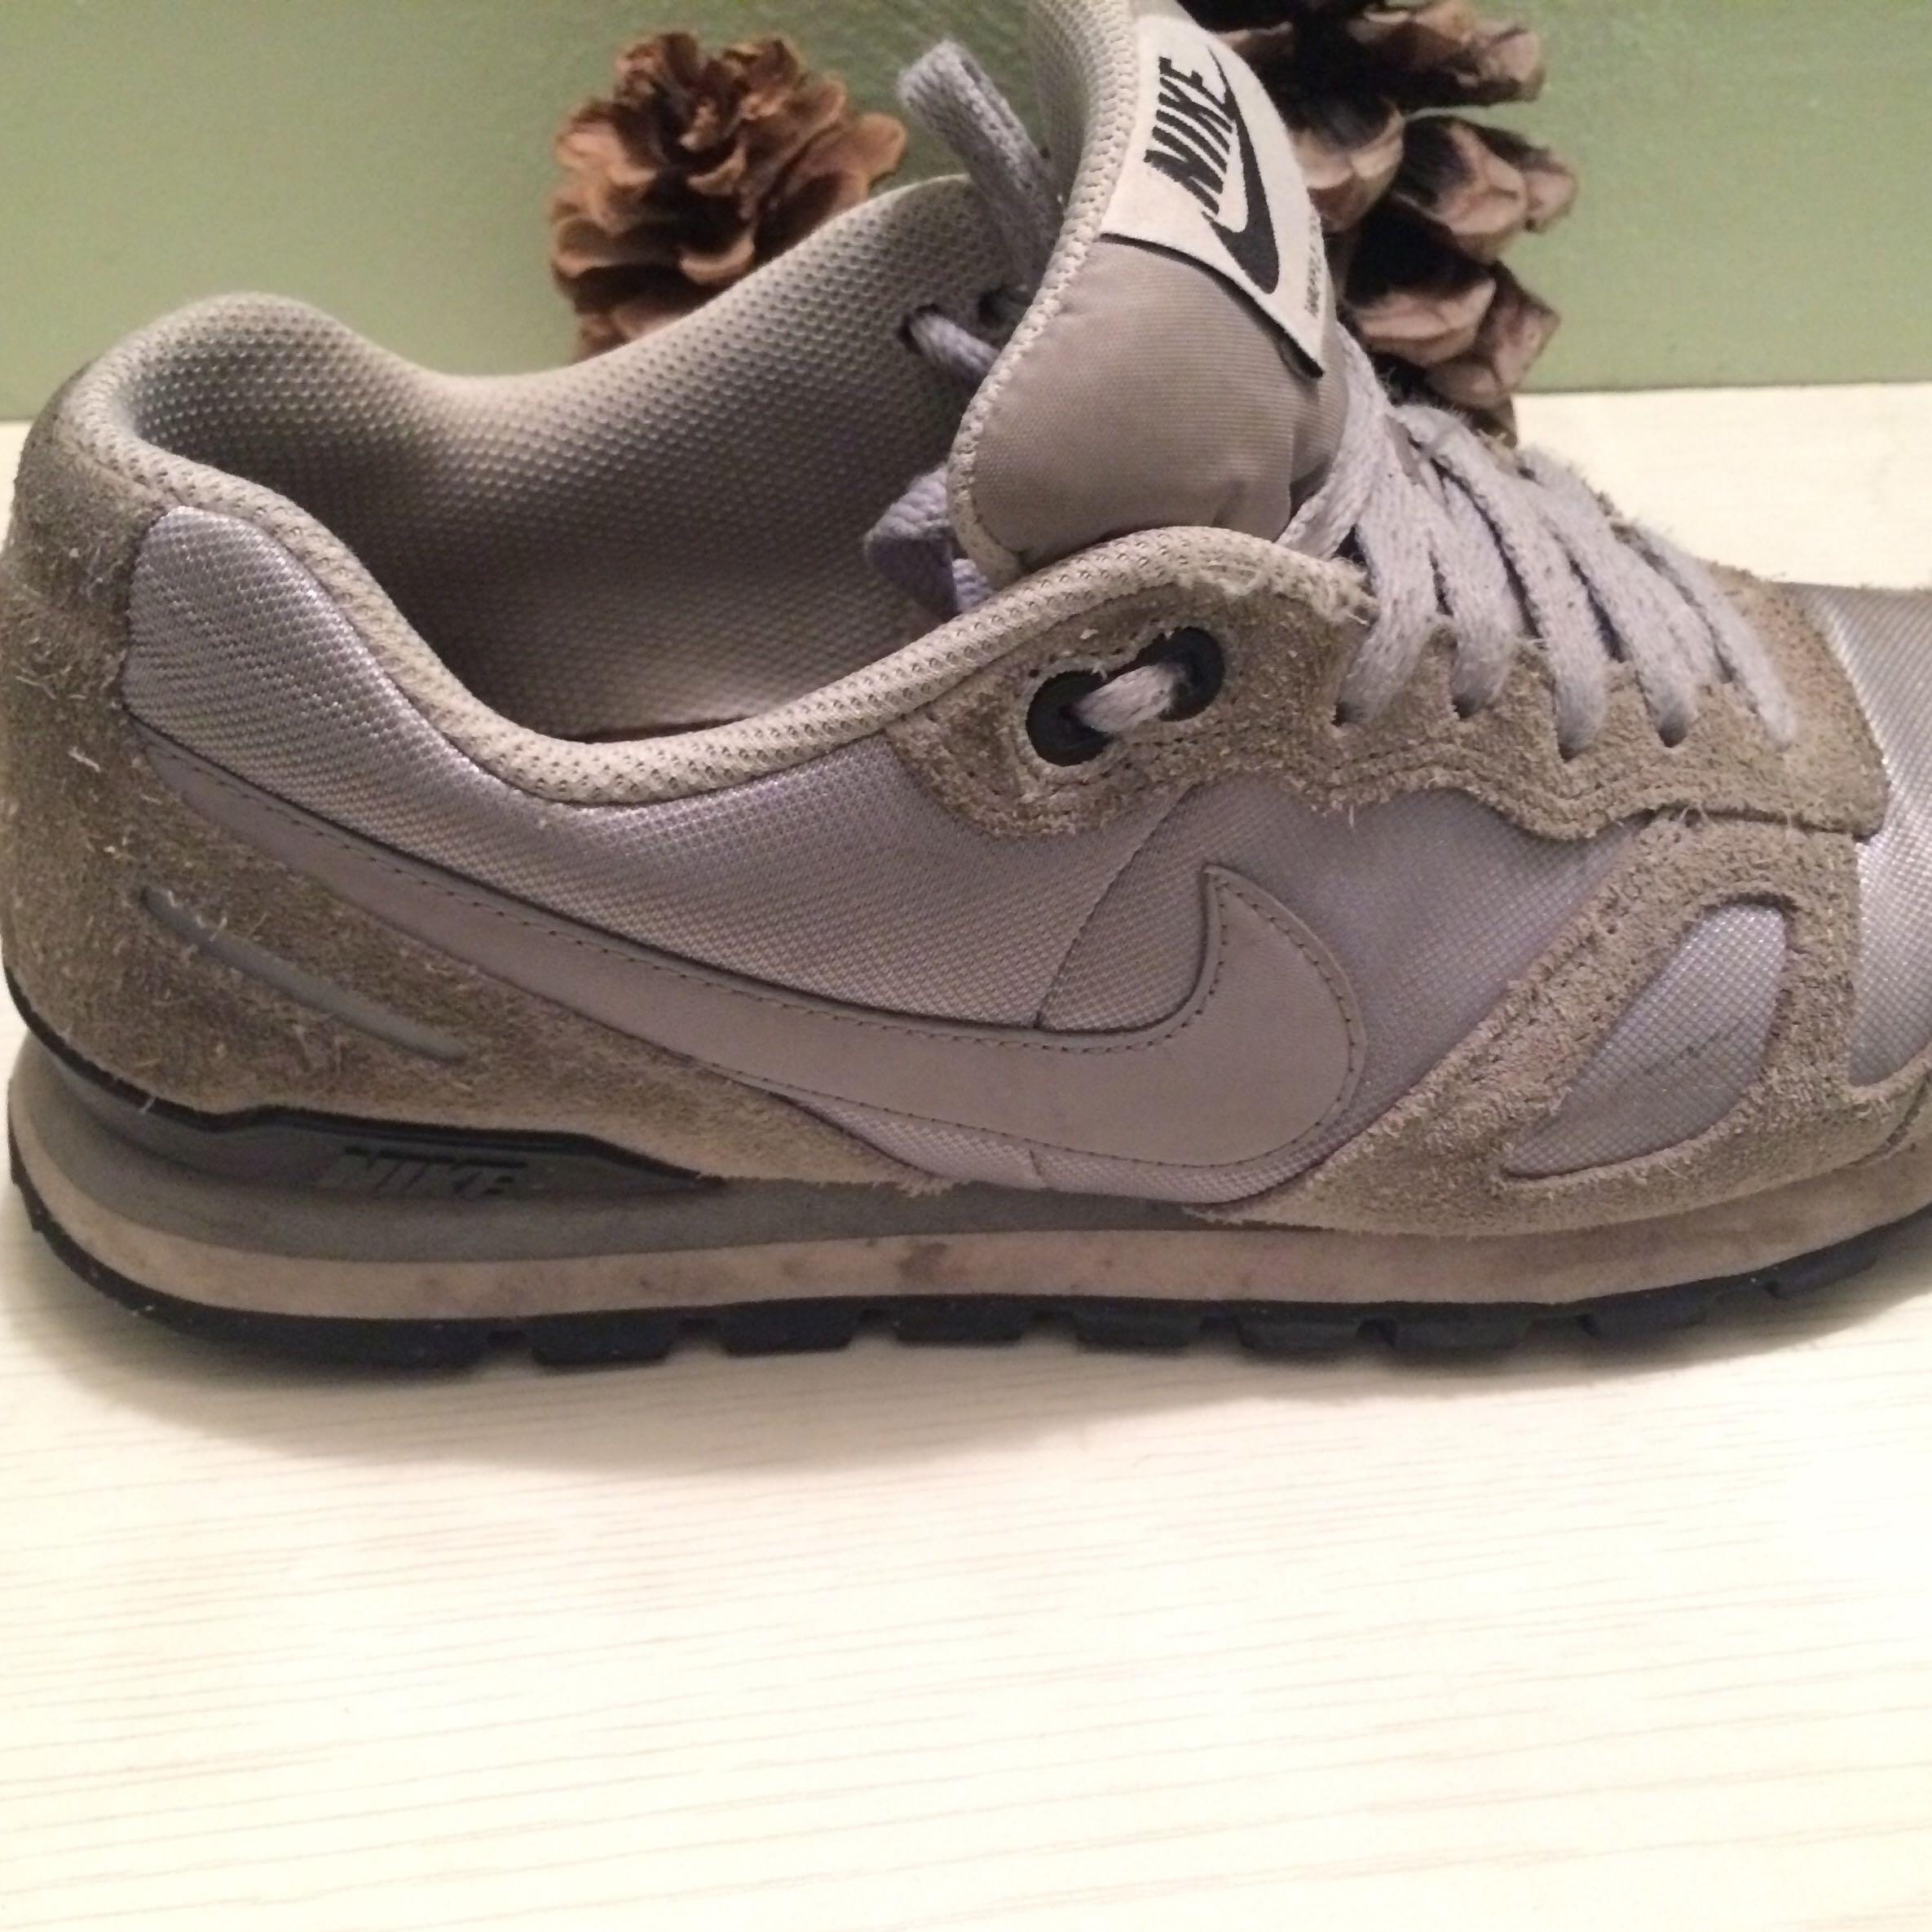 Weisse Schuhe Sauber Machen Nike – CJTA.NET